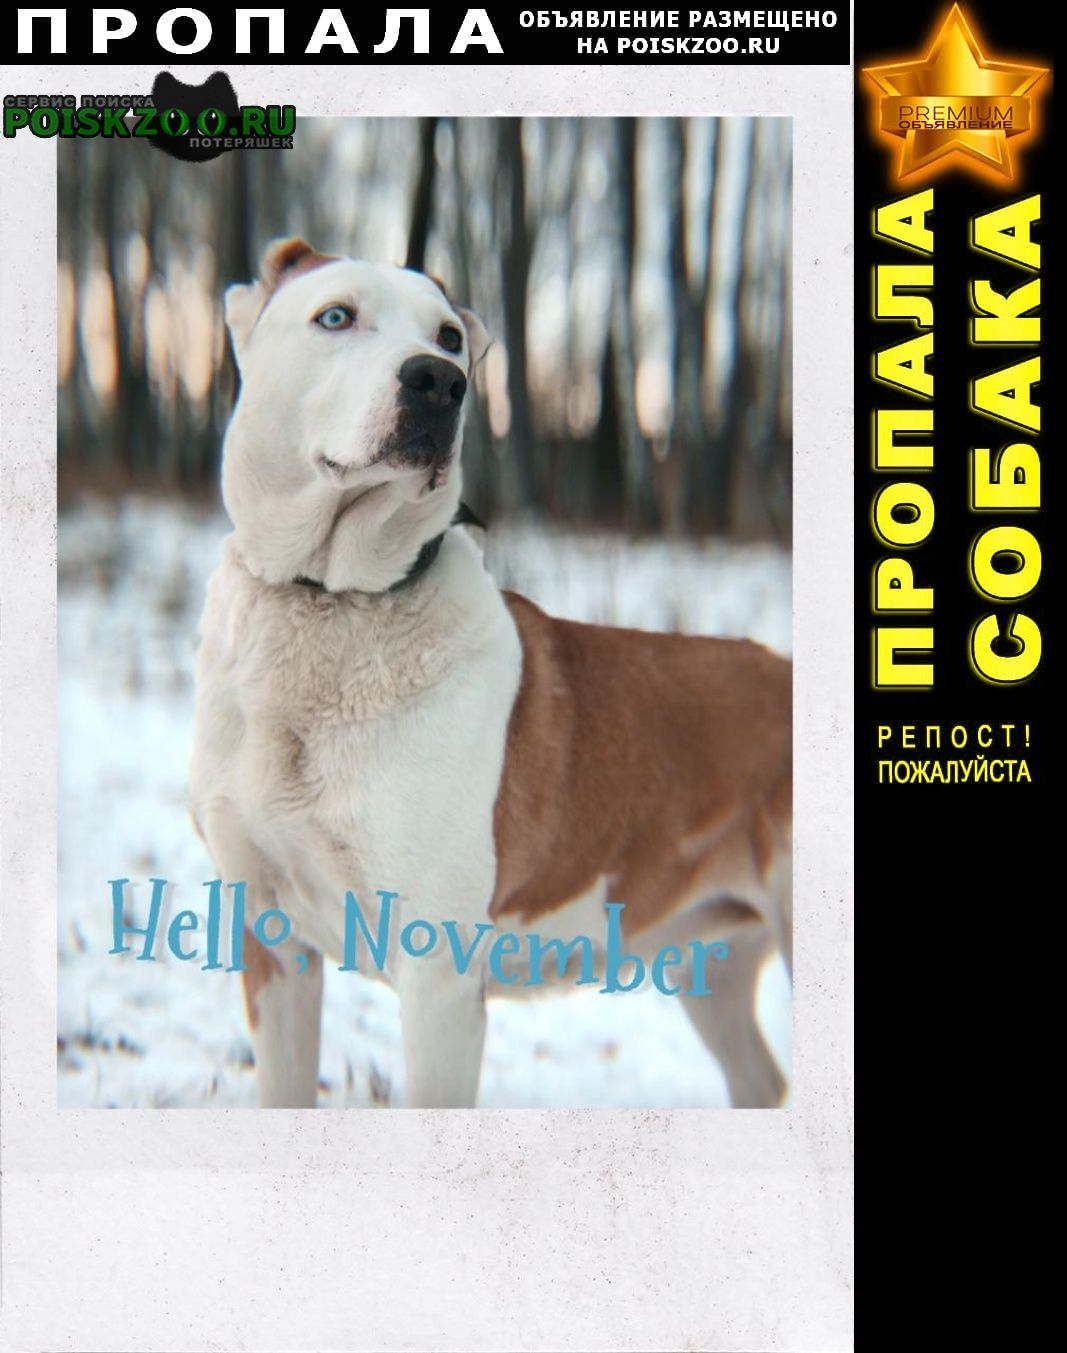 Пропала собака район поиска нара-обнинск Балабаново